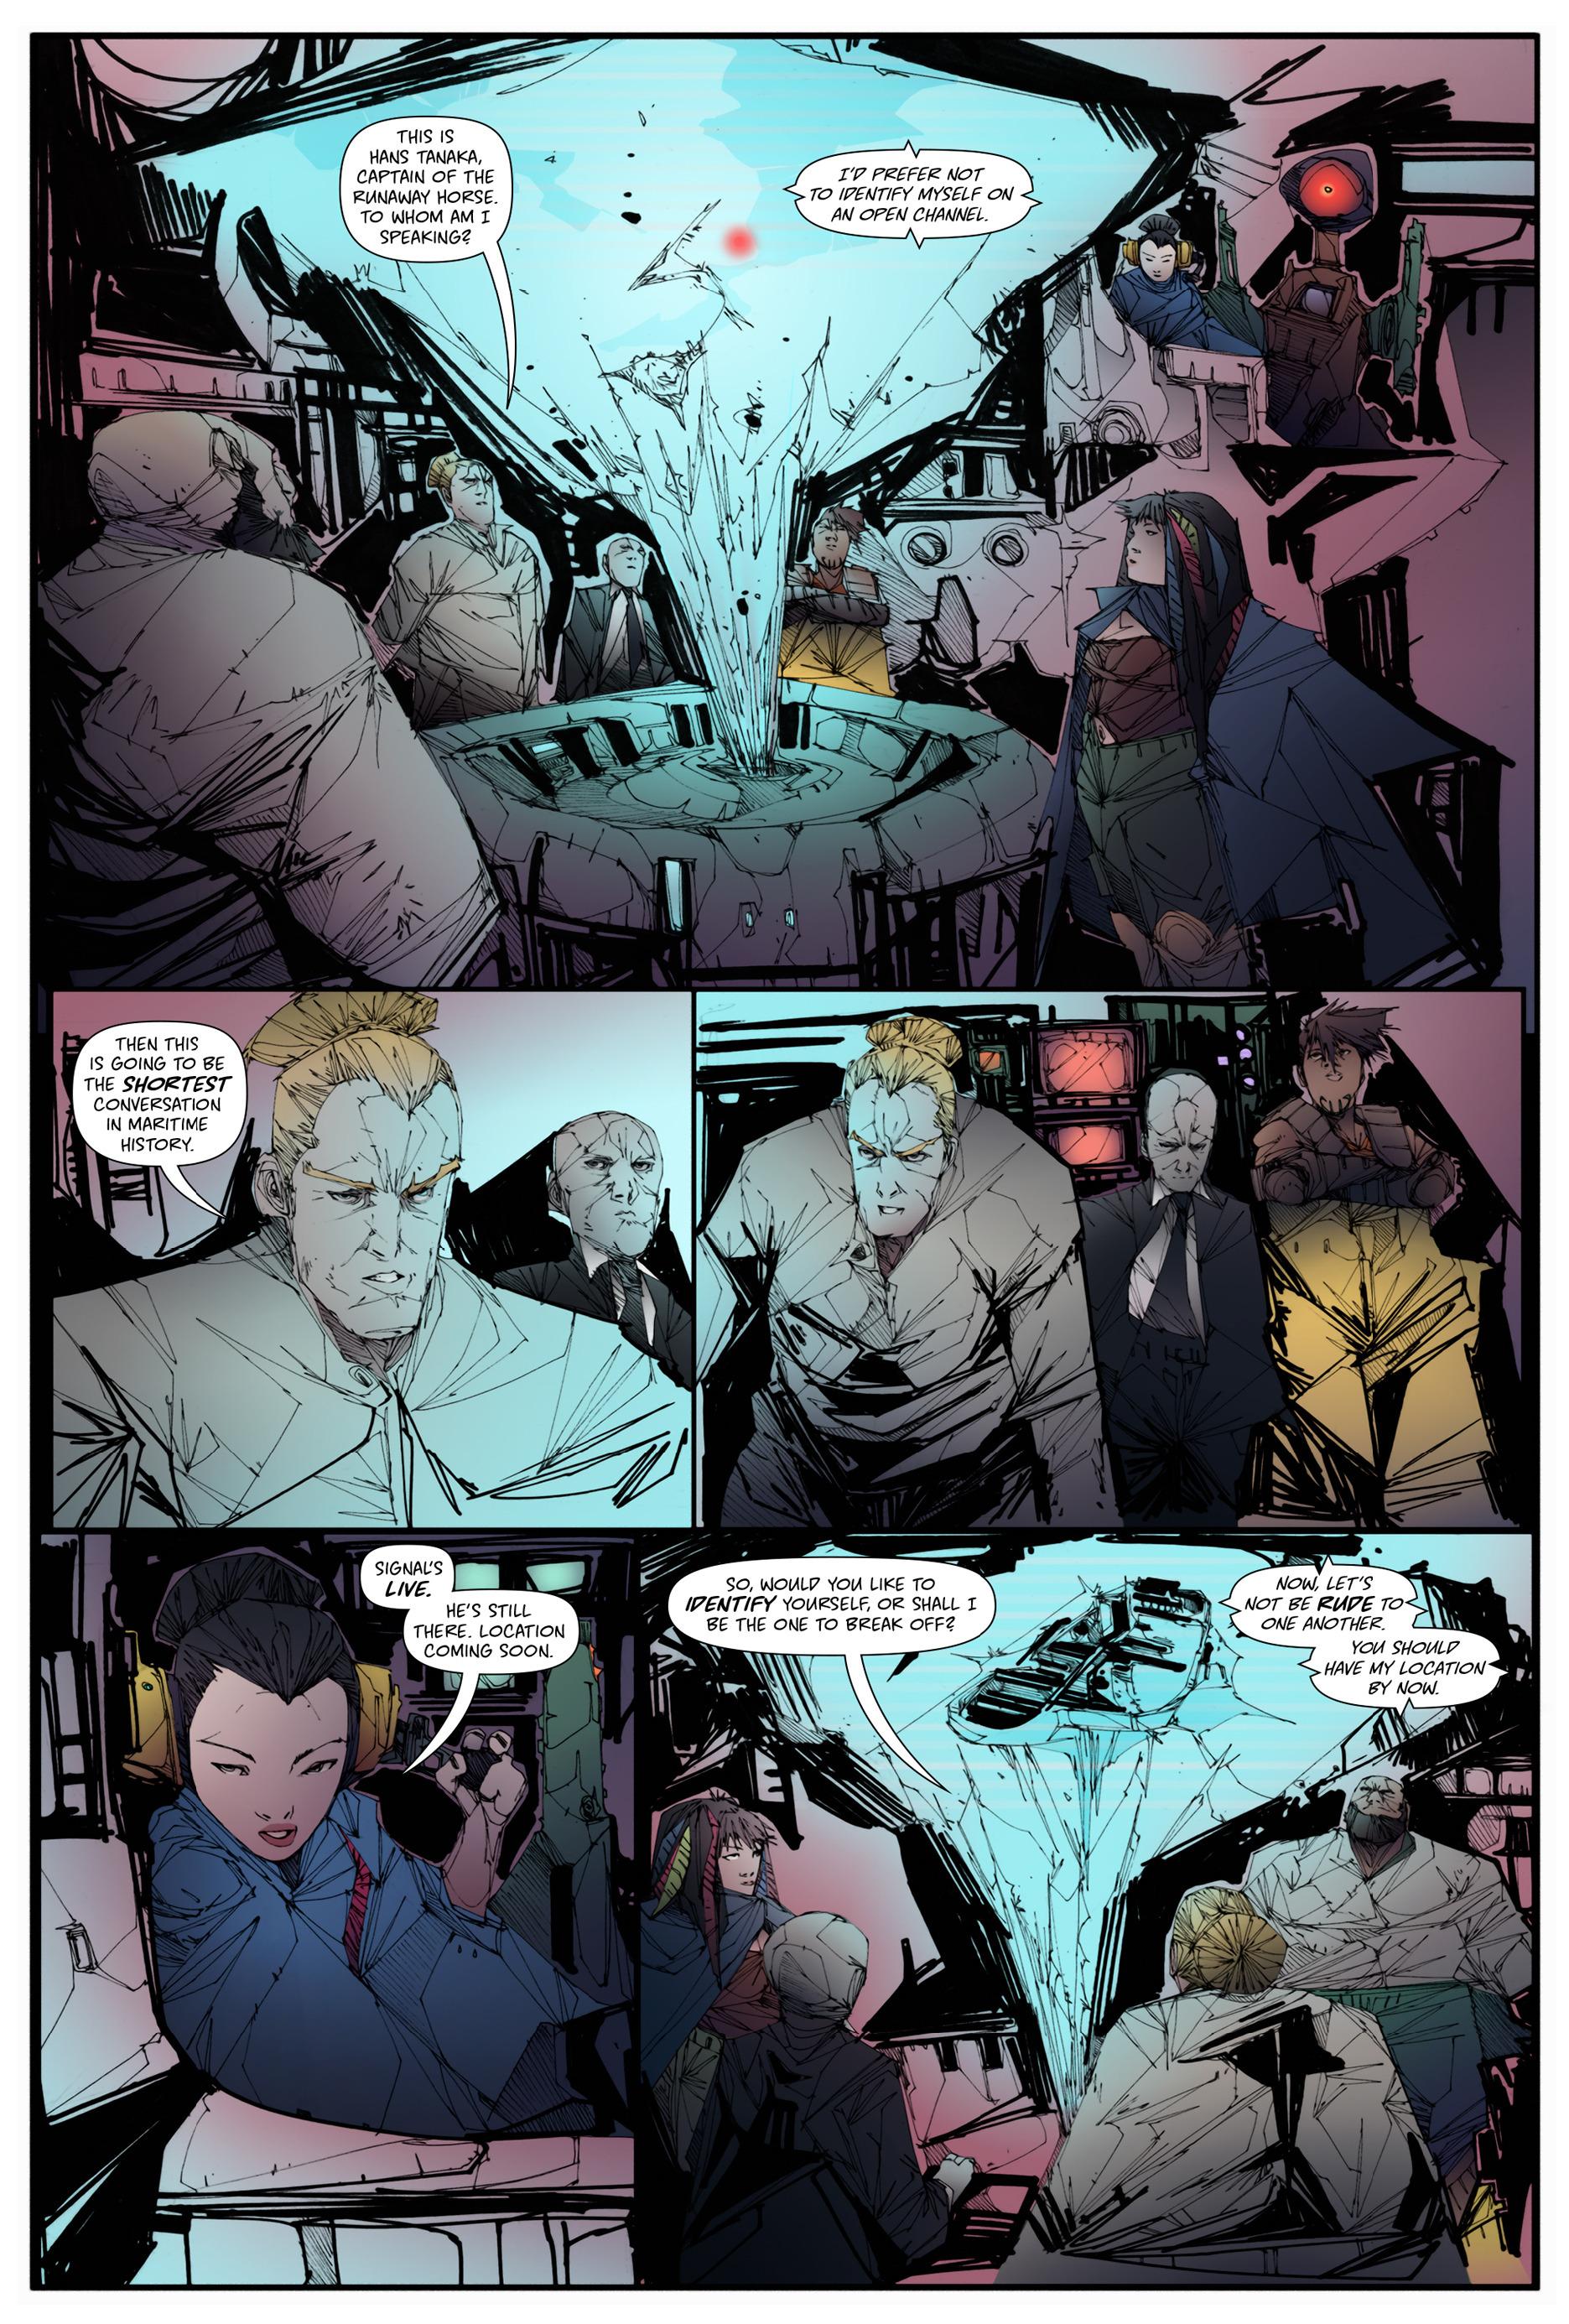 Read online Scrimshaw comic -  Issue #2 - 16